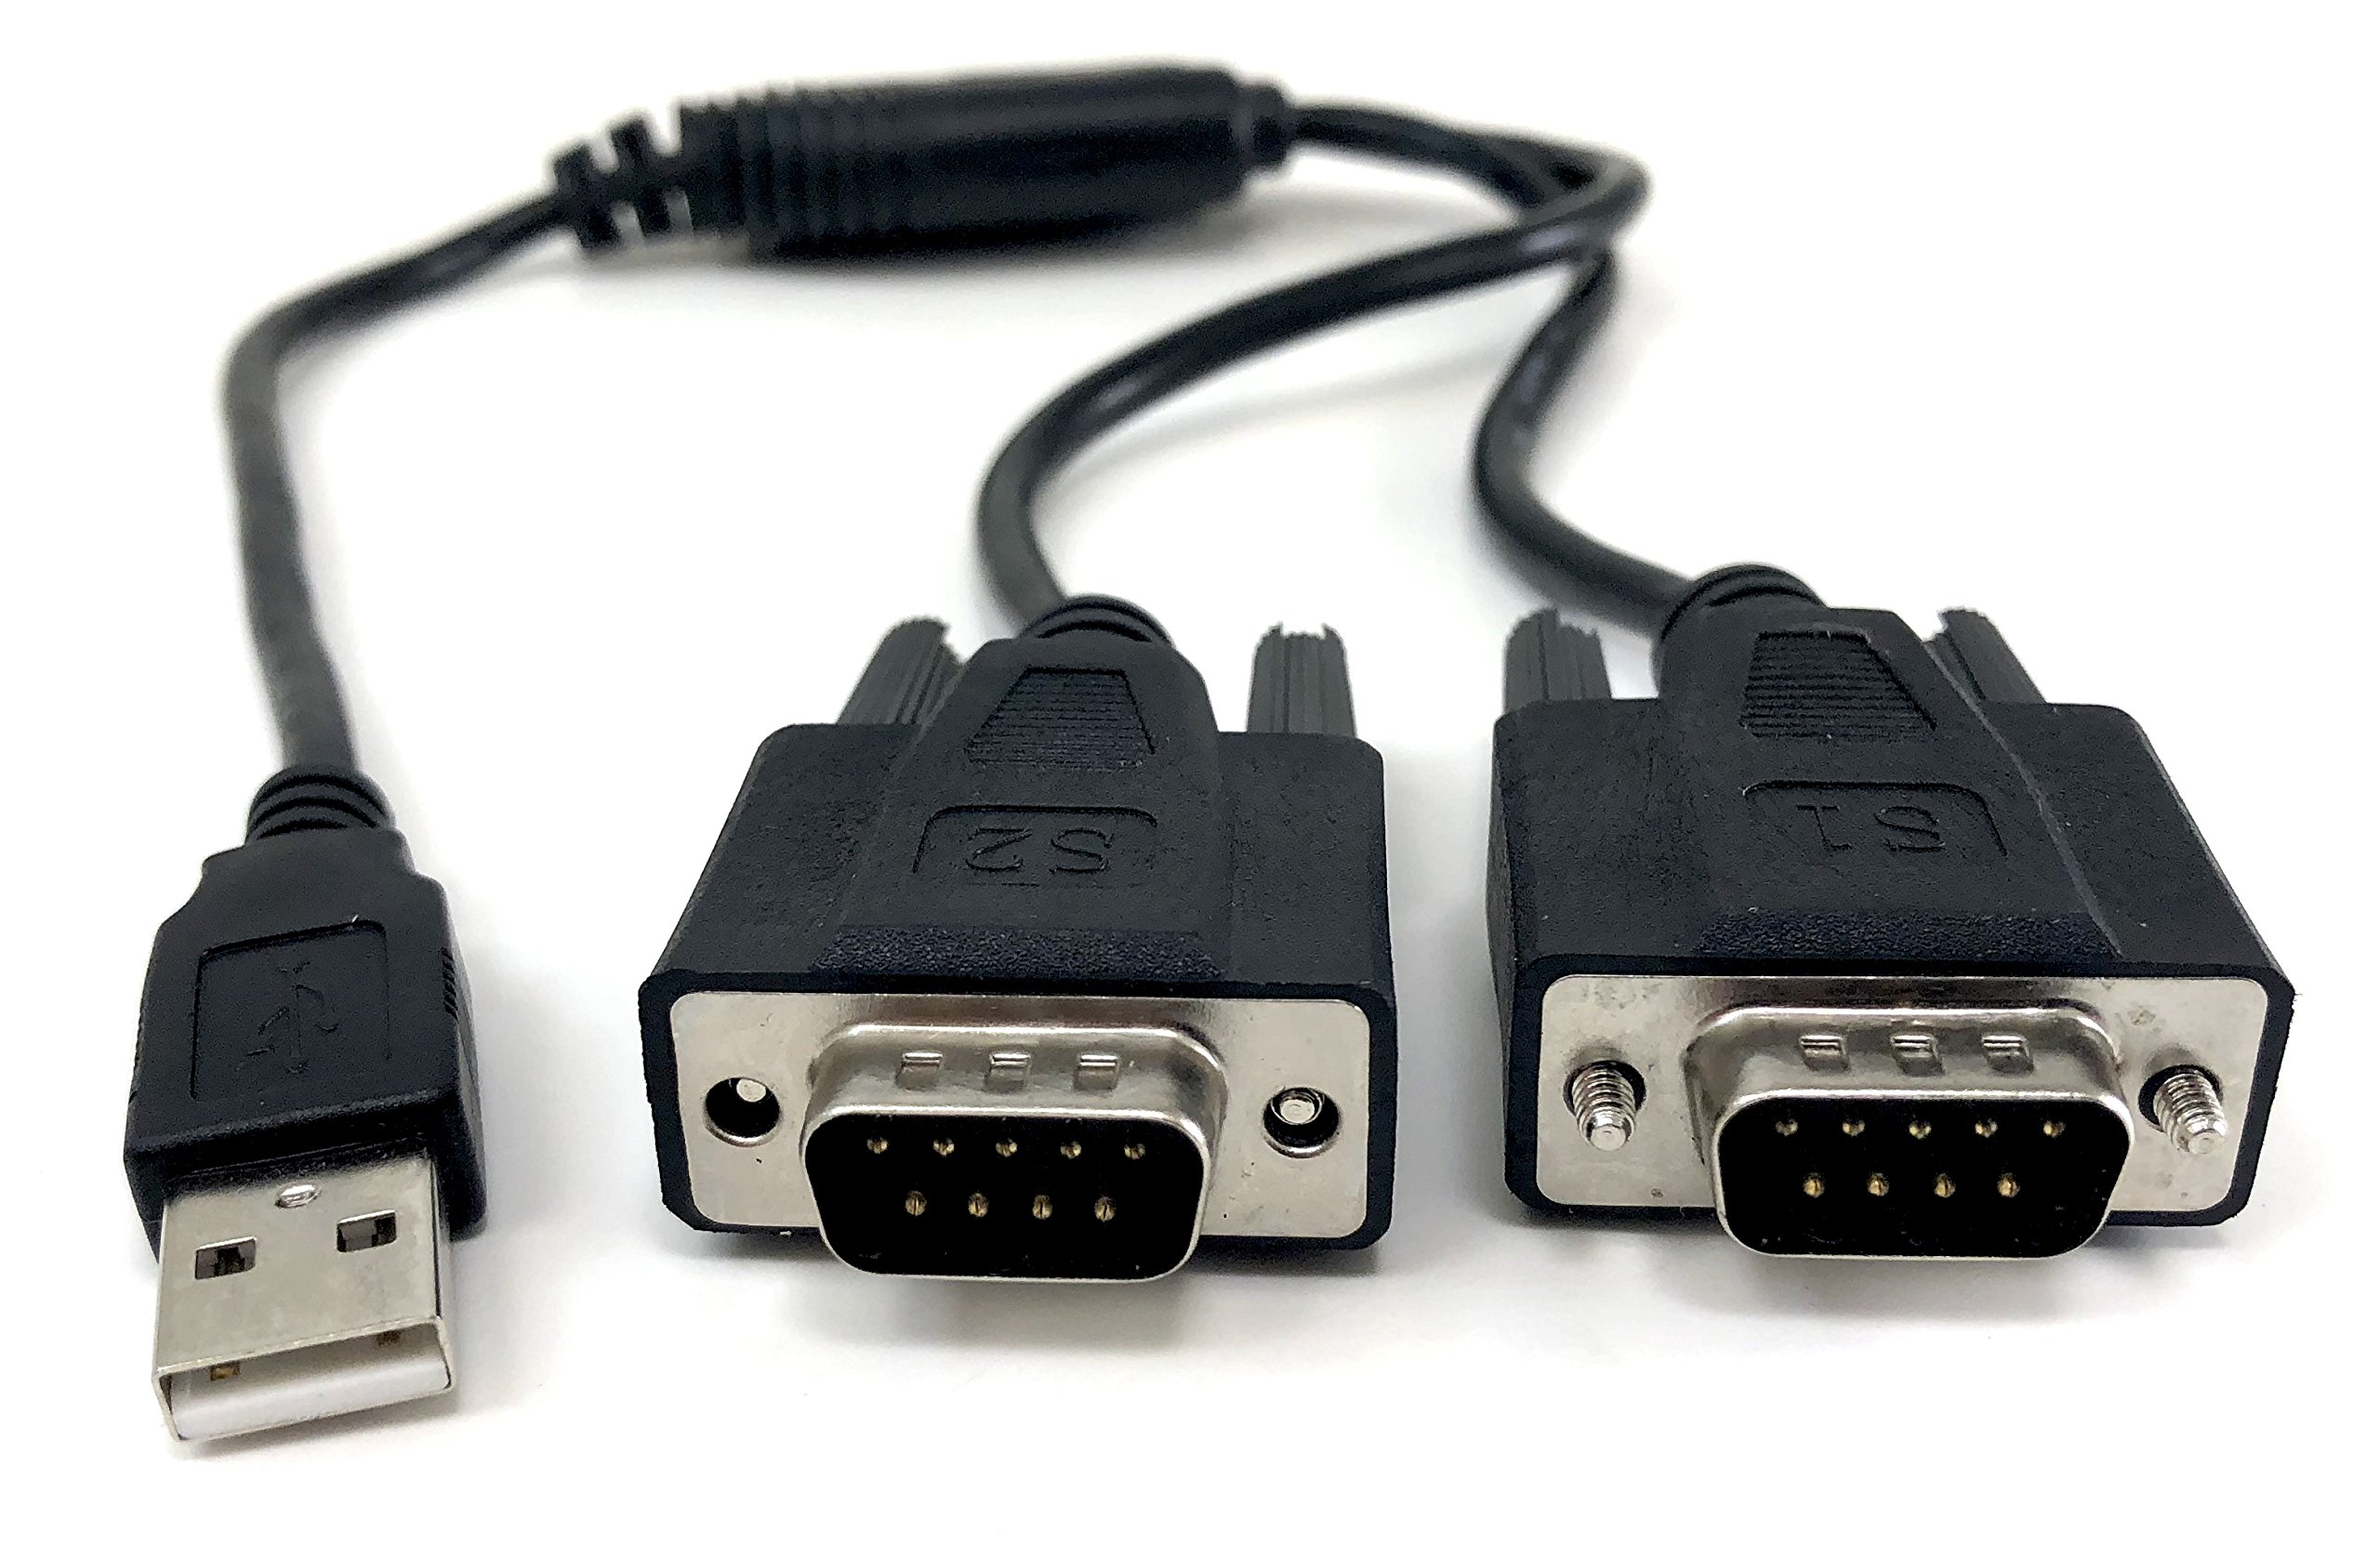 Micro Connectors, Inc. Plug and Play USB to Dual Serial DB9 Adapter Windows 10 / Win 8/ 7/ XP/ Vista / Mac (E07-162) by MICRO CONNECTORS